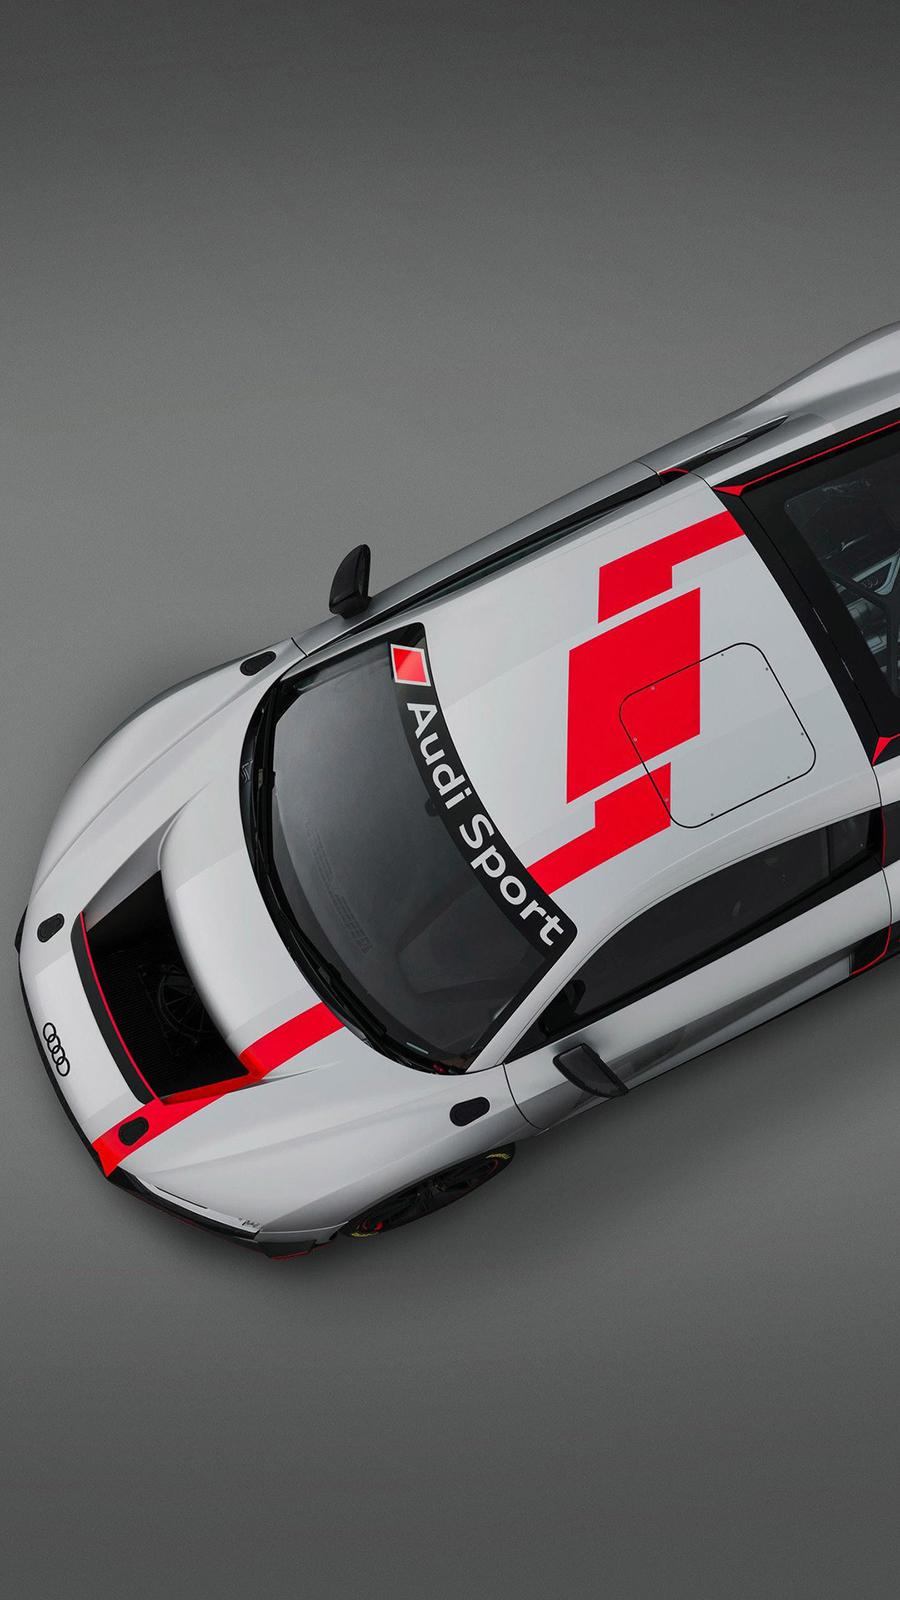 Audi R8 Gt4 Top View hd Wallpaper